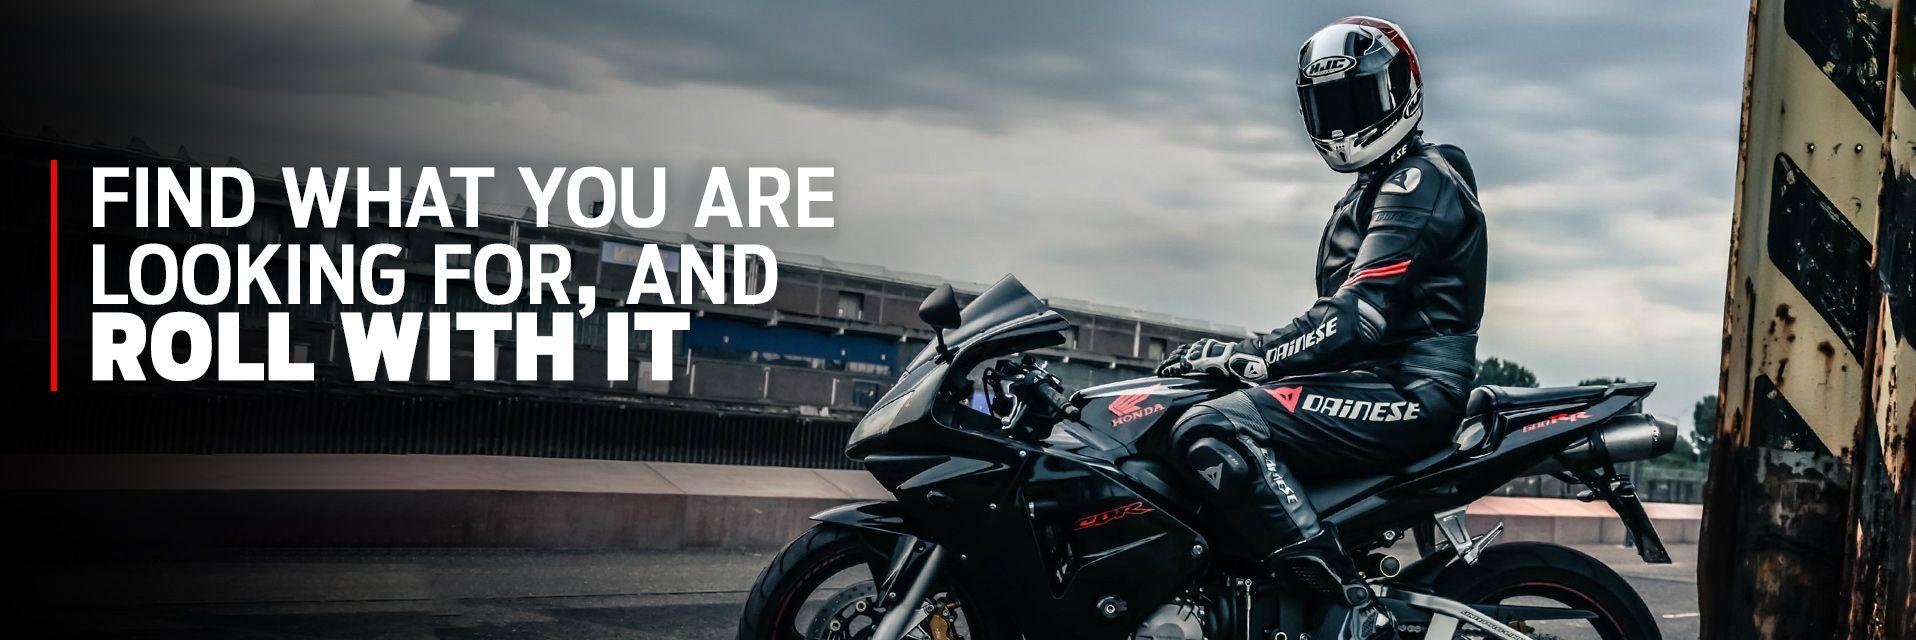 JP MotorSports | Outboard Motors & Used Motorcycle Dealer